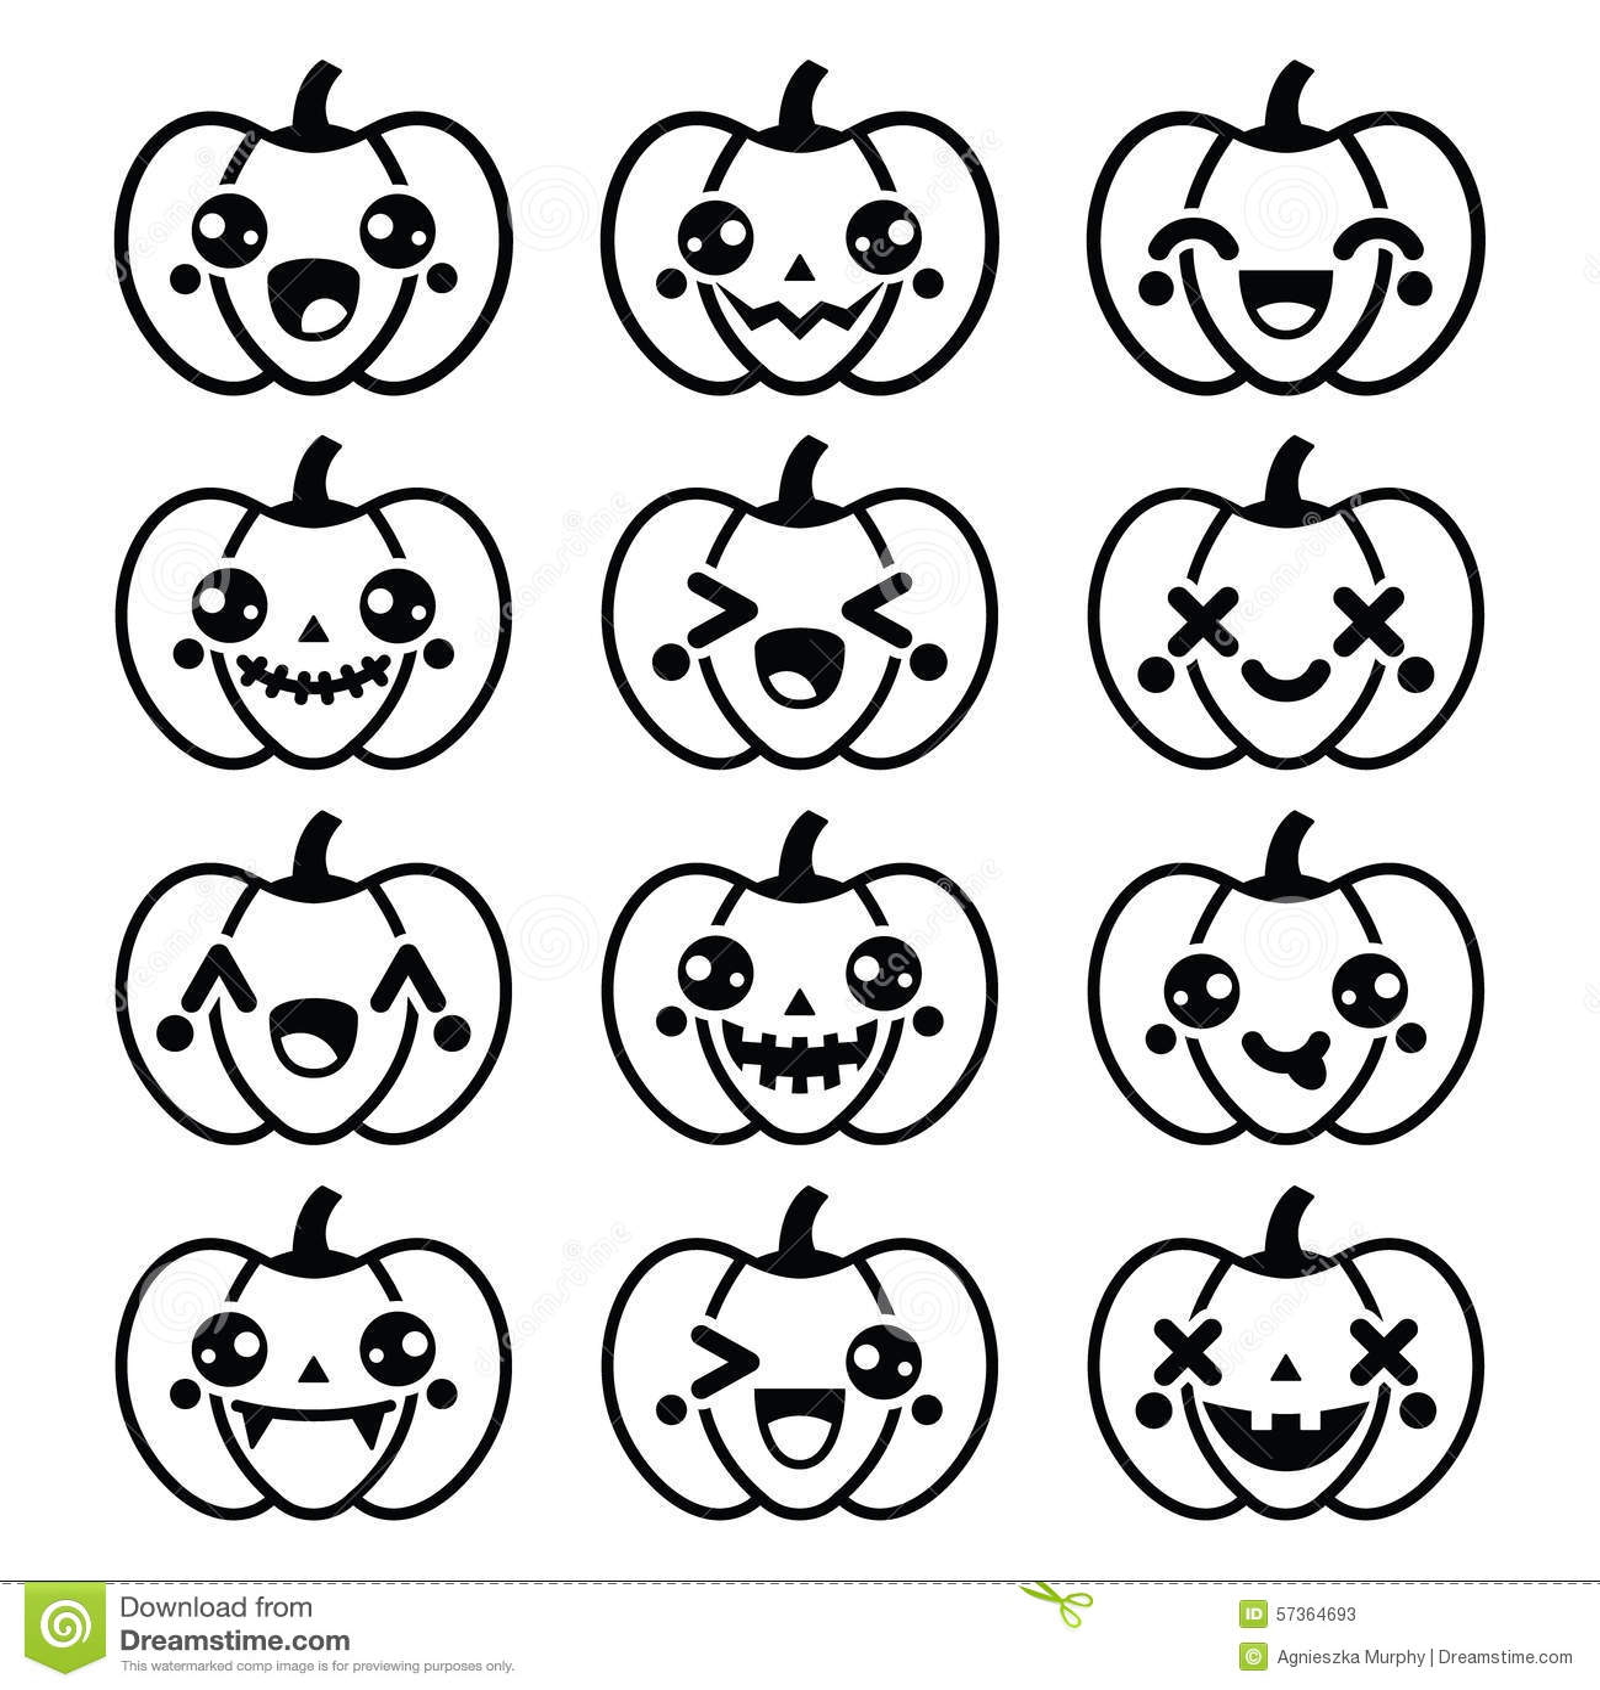 Halloween Kawaii Cute Black Pumpkin Icons